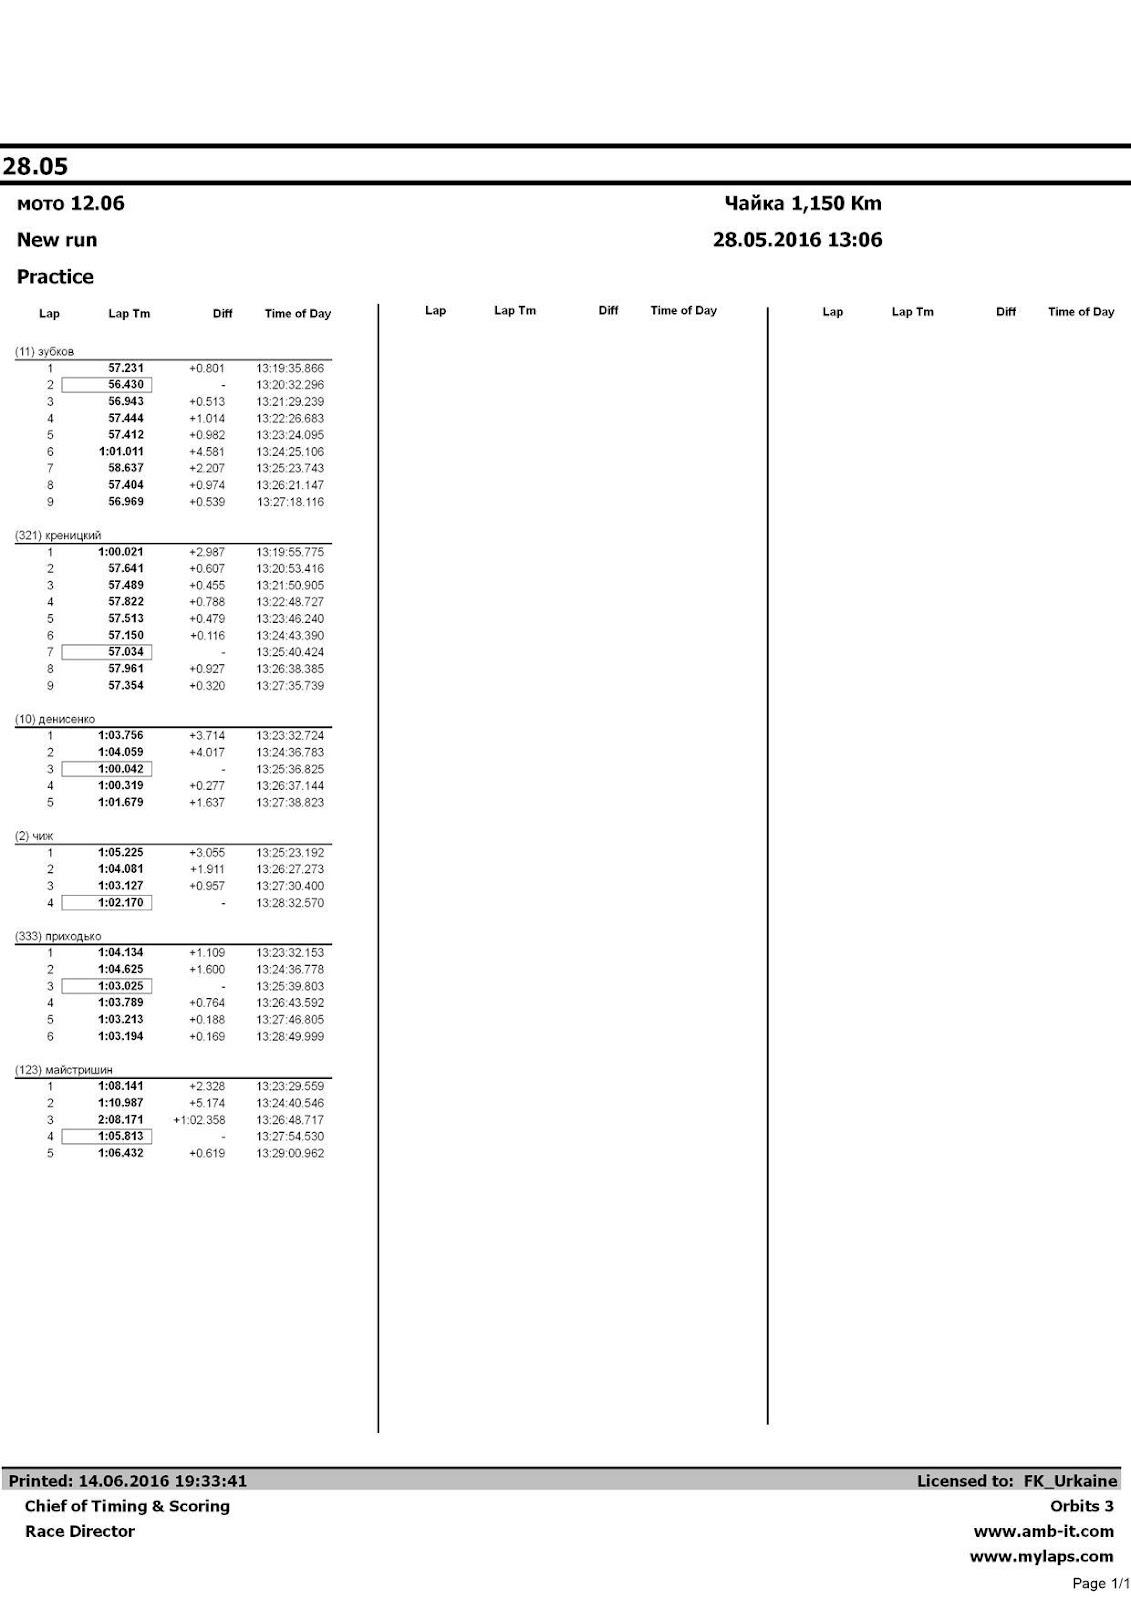 Автоматически созданный замещающий текст: Lap Lap Tm Diff Time of Day Lap Lap Tm Diff Time of Day Lap (11) зубков 1 2 3 4 5 6 7 8 9 (321) креницкий 1 2 3 4 5 6 7 8 9 (10) денисенко 1 2 3 4 5 (2) чиж 1 2 3 4 (333) приходько 1 2 3 4 5 6 (123) майстришин 1 2 3 4 5 Lap Tm 57.231 56.430 56.943 57.444 57.412 1:01.011 58.637 57.404 56.969 1:00.021 57.641 57.489 57.822 57.513 57.150 57.034 57.961 57.354 1:03.756 1:04.059 1:00.042 1:00.319 1:01.679 1:05.225 1:04.081 1:03.127 1:02.170 1:04.134 1:04.625 1:03.025 1:03.789 1:03.213 1:03.194 1:08.141 1:10.987 2:08.171 1:05.813 1:06.432 Diff +0.801 - +0.513 +1.014 +0.982 +4.581 +2.207 +0.974 +0.539 +2.987 +0.607 +0.455 +0.788 +0.479 +0.116 - +0.927 +0.320 +3.714 +4.017 - +0.277 +1.637 +3.055 +1.911 +0.957 - +1.109 +1.600 - +0.764 +0.188 +0.169 +2.328 +5.174 +1:02.358 - +0.619 Time of Day 13:19:35.866 13:20:32.296 13:21:29.239 13:22:26.683 13:23:24.095 13:24:25.106 13:25:23.743 13:26:21.147 13:27:18.116 13:19:55.775 13:20:53.416 13:21:50.905 13:22:48.727 13:23:46.240 13:24:43.390 13:25:40.424 13:26:38.385 13:27:35.739 13:23:32.724 13:24:36.783 13:25:36.825 13:26:37.144 13:27:38.823 13:25:23.192 13:26:27.273 13:27:30.400 13:28:32.570 13:23:32.153 13:24:36.778 13:25:39.803 13:26:43.592 13:27:46.805 13:28:49.999 13:23:29.559 13:24:40.546 13:26:48.717 13:27:54.530 13:29:00.962 28.05 мото 12.06 New run Practice Чайка 1,150 Km 28.05.2016 13:06 Printed: 14.06.2016 19:33:41 Chief of Timing & Scoring Race Director Licensed to: FK_Urkaine Orbits 3 www.amb-it.com www.mylaps.com Page 1/1